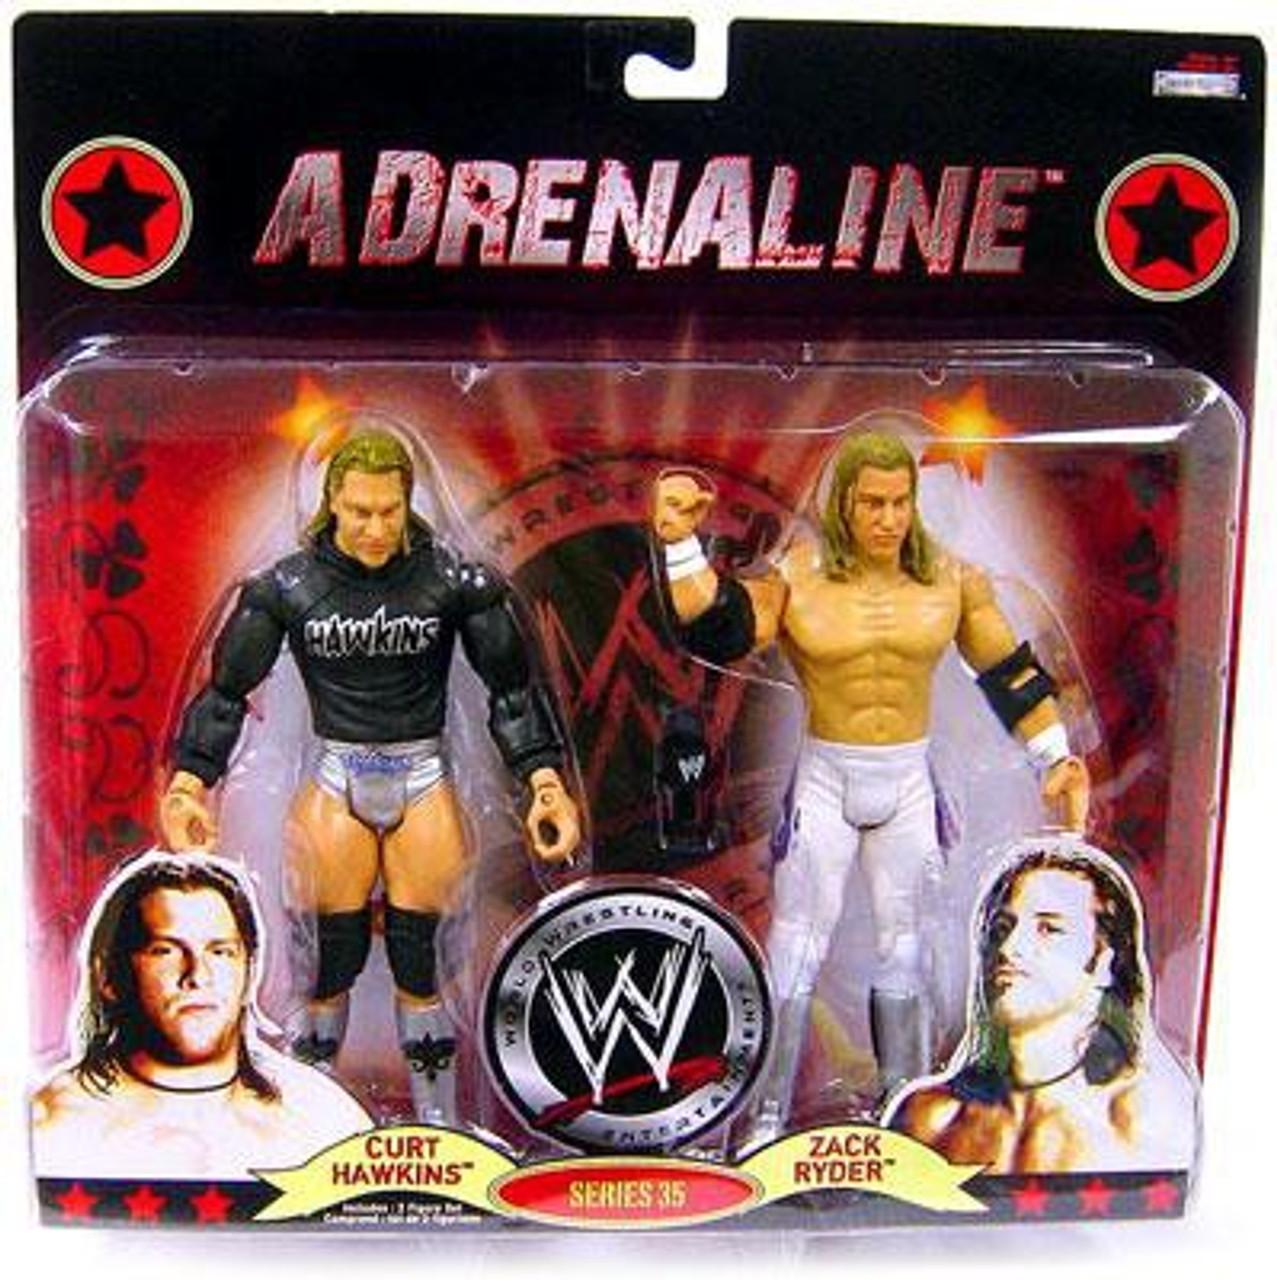 WWE Wrestling Adrenaline Series 35 Curt Hawkins & Zack Ryder Action Figure 2-Pack